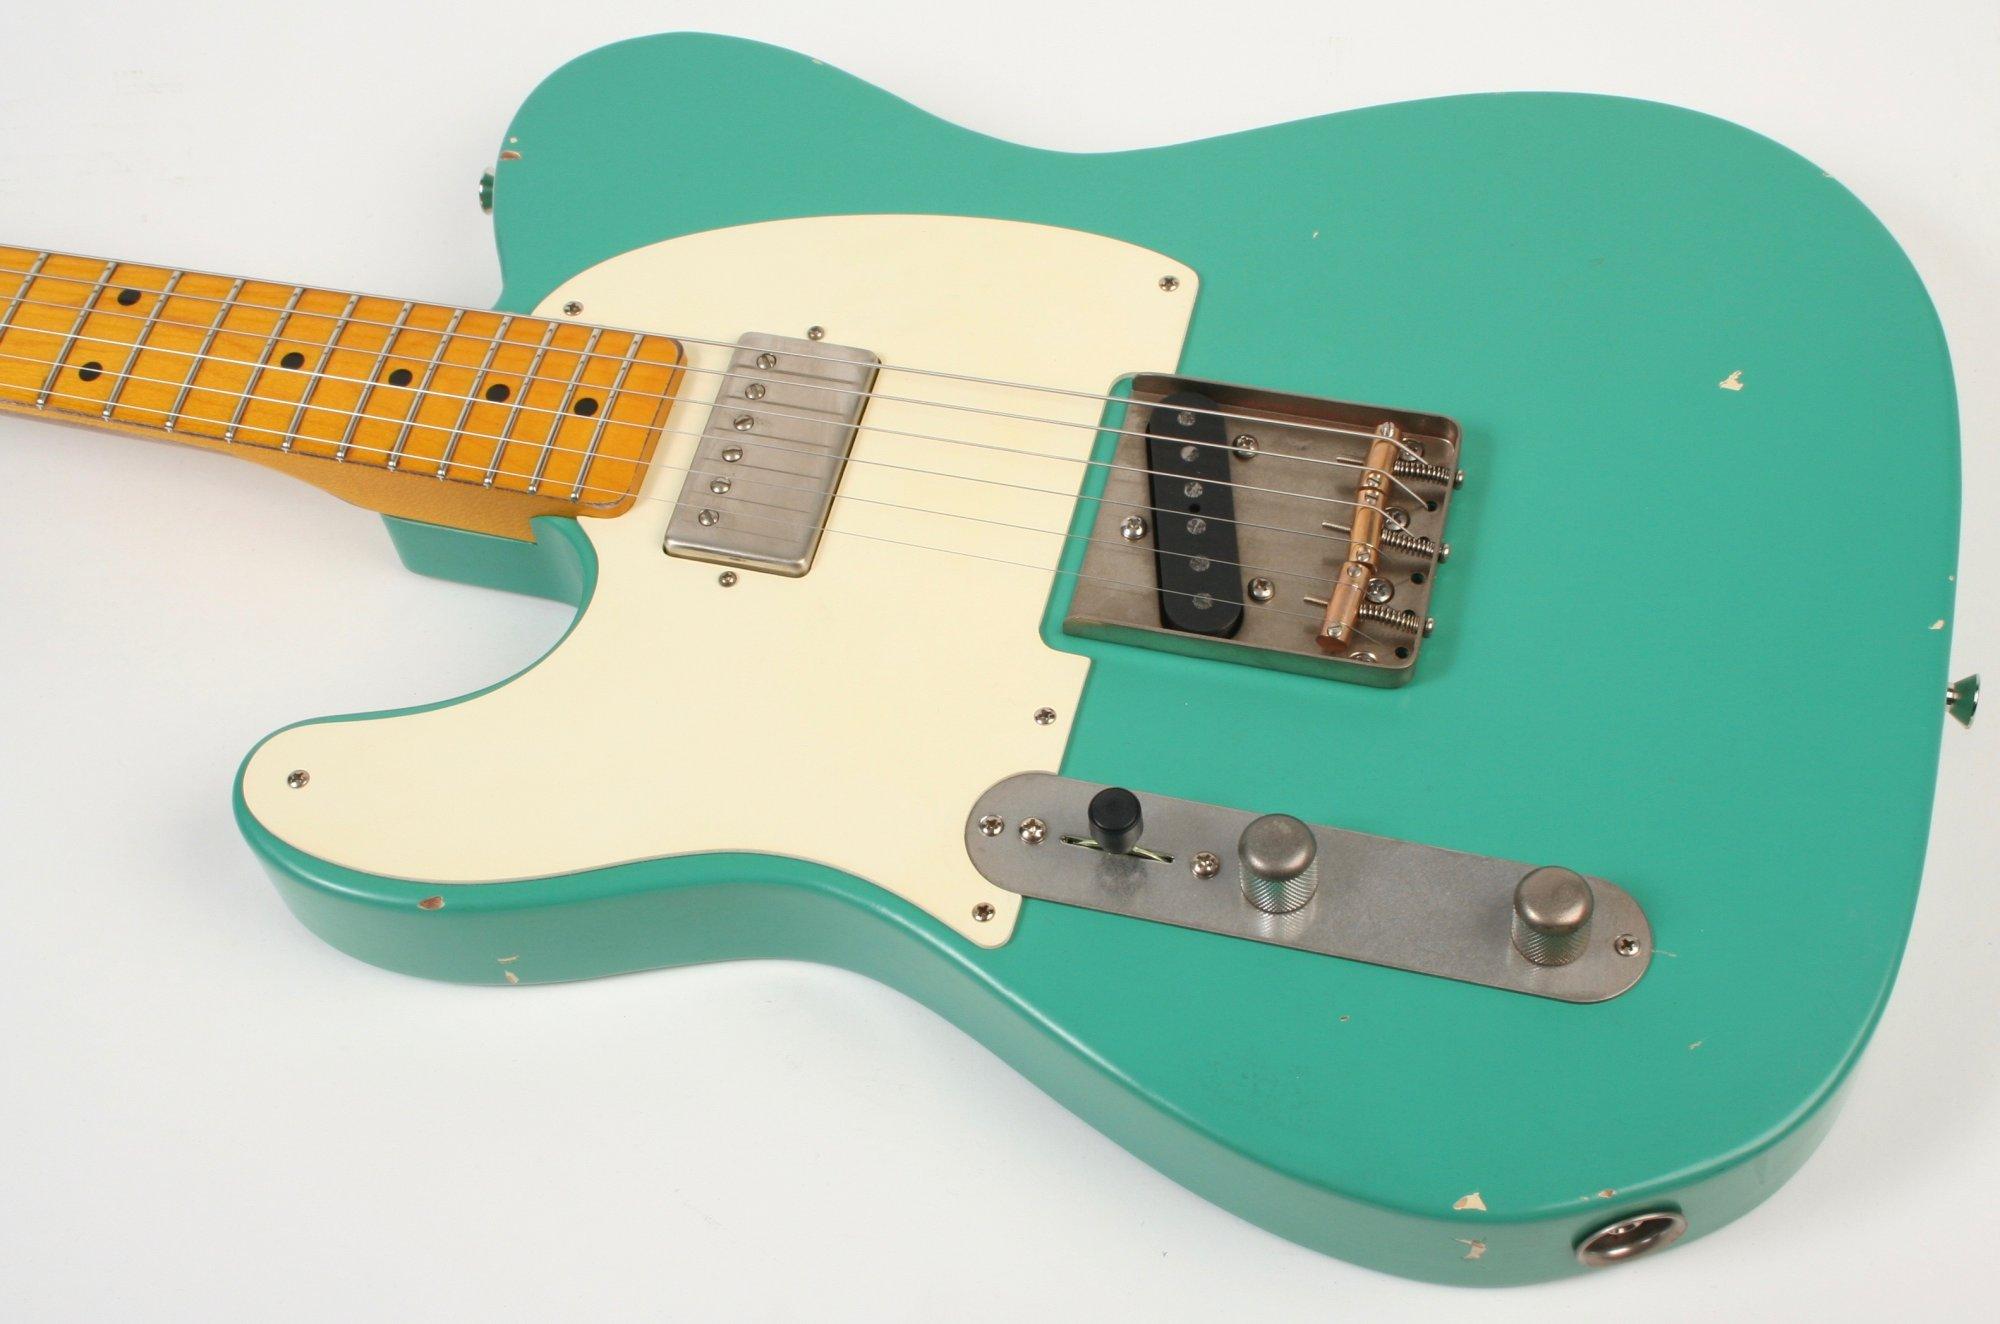 Nash Guitars T-57 Seafoam Green Humbucker Neck Lefty